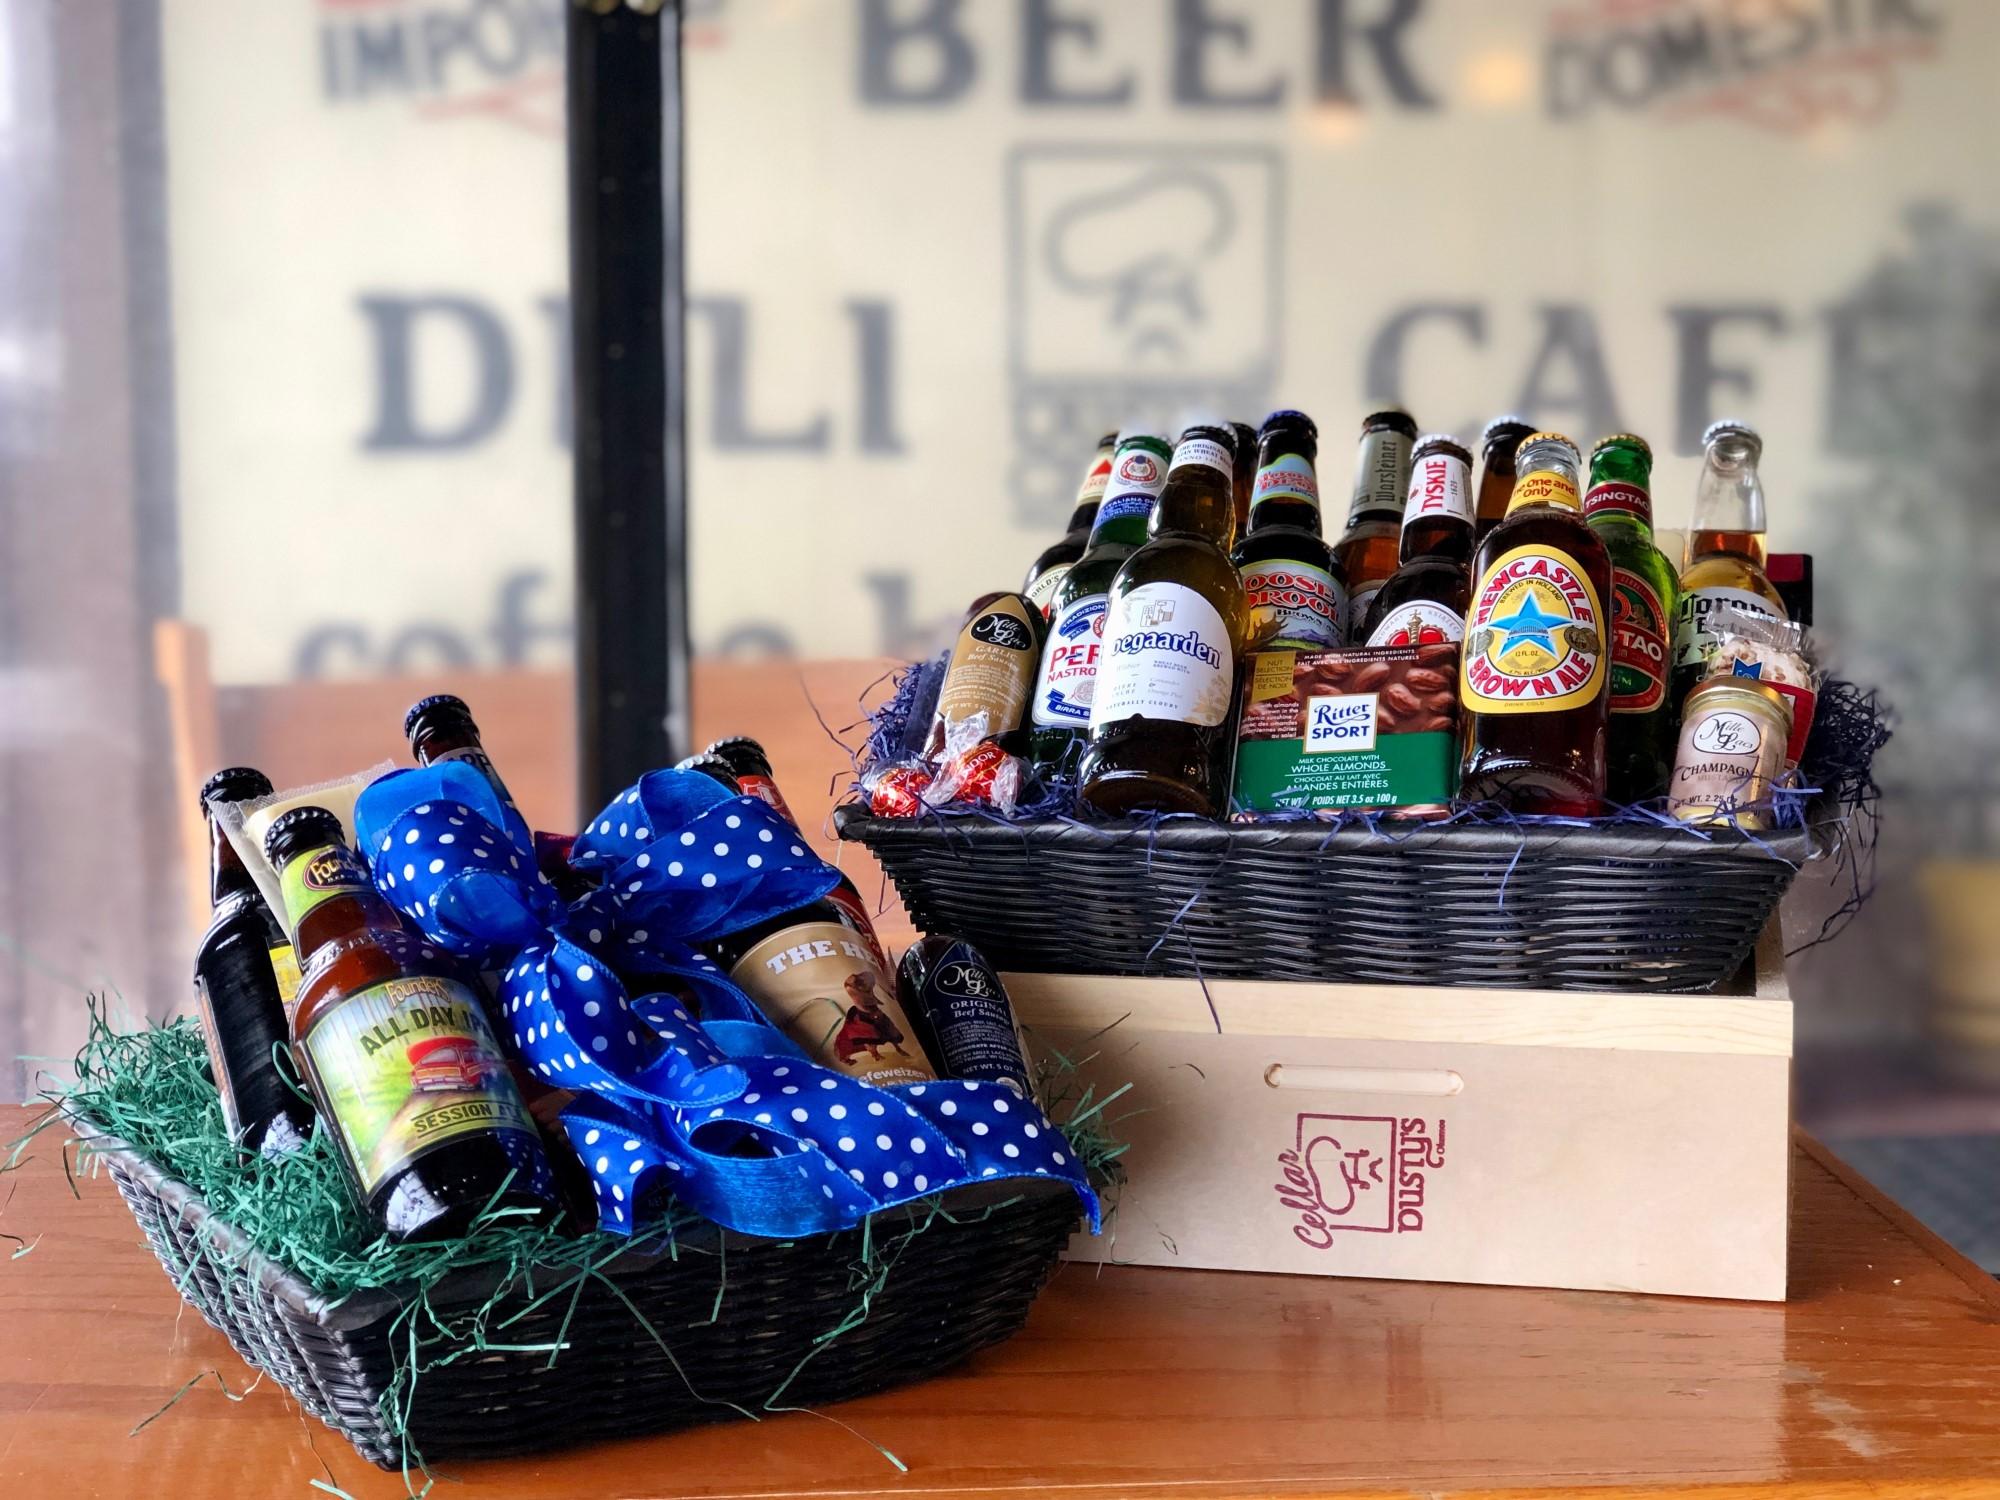 Beer & Snack Basket